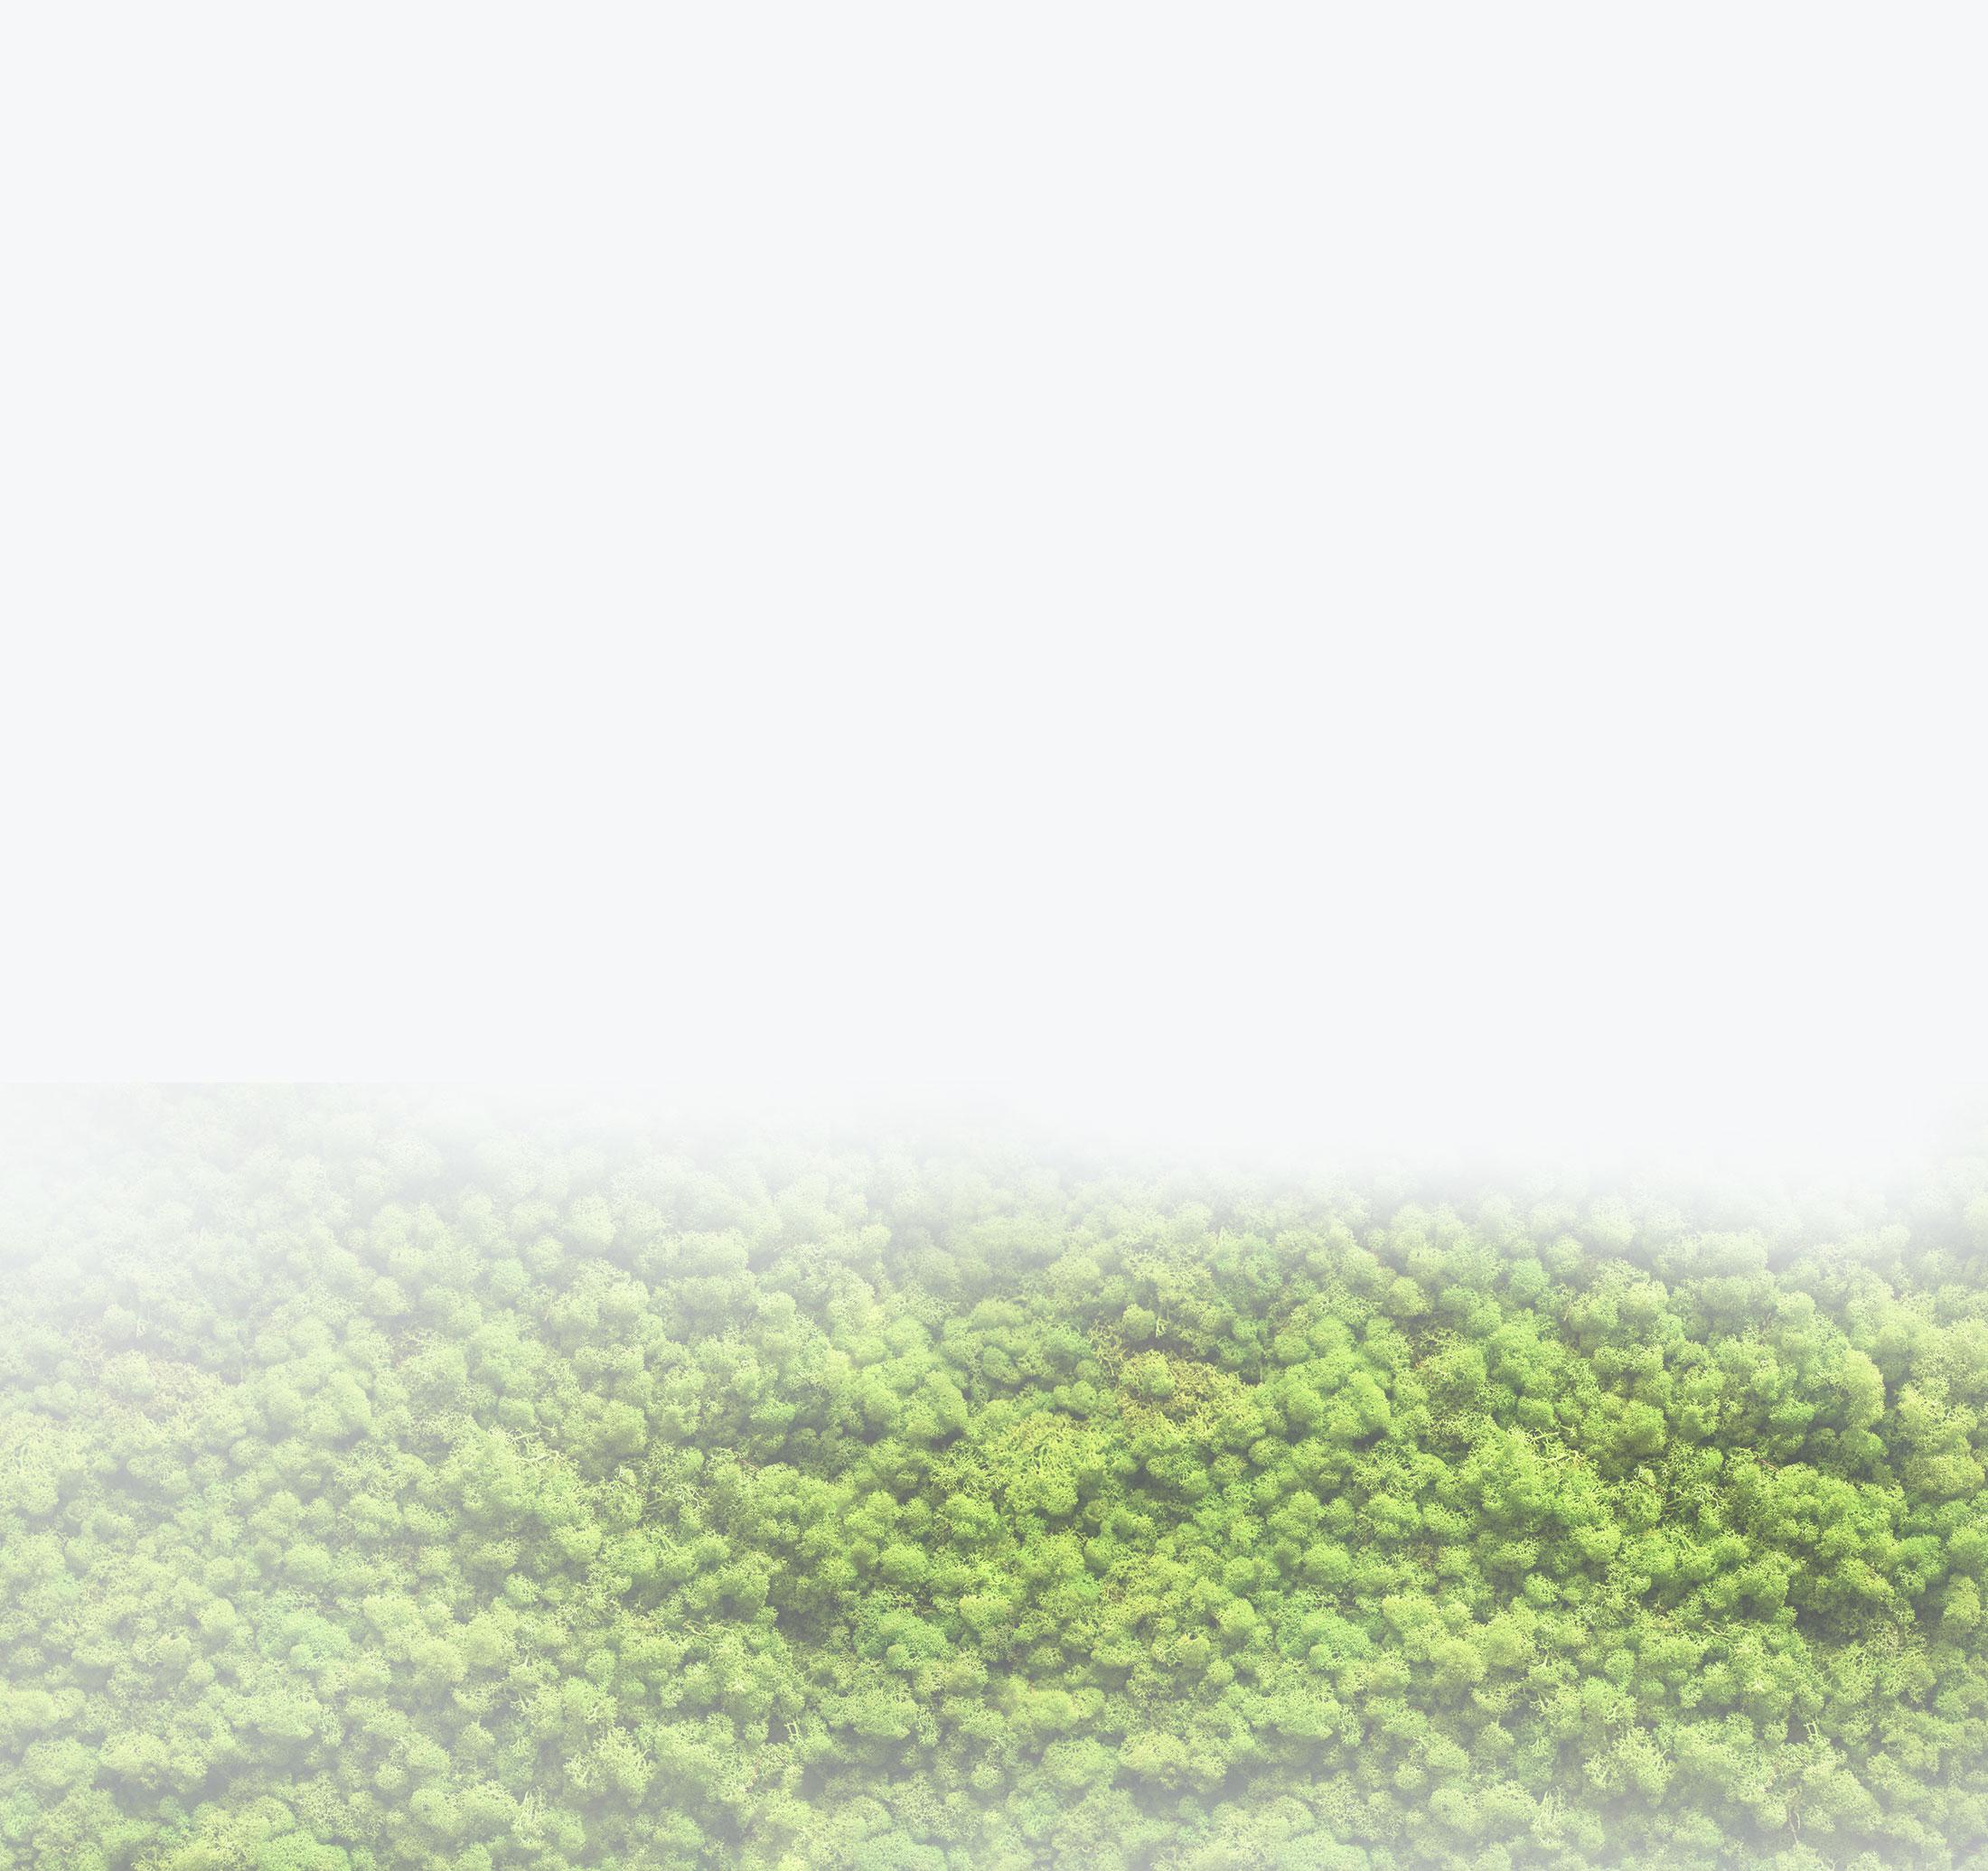 background_green.jpg